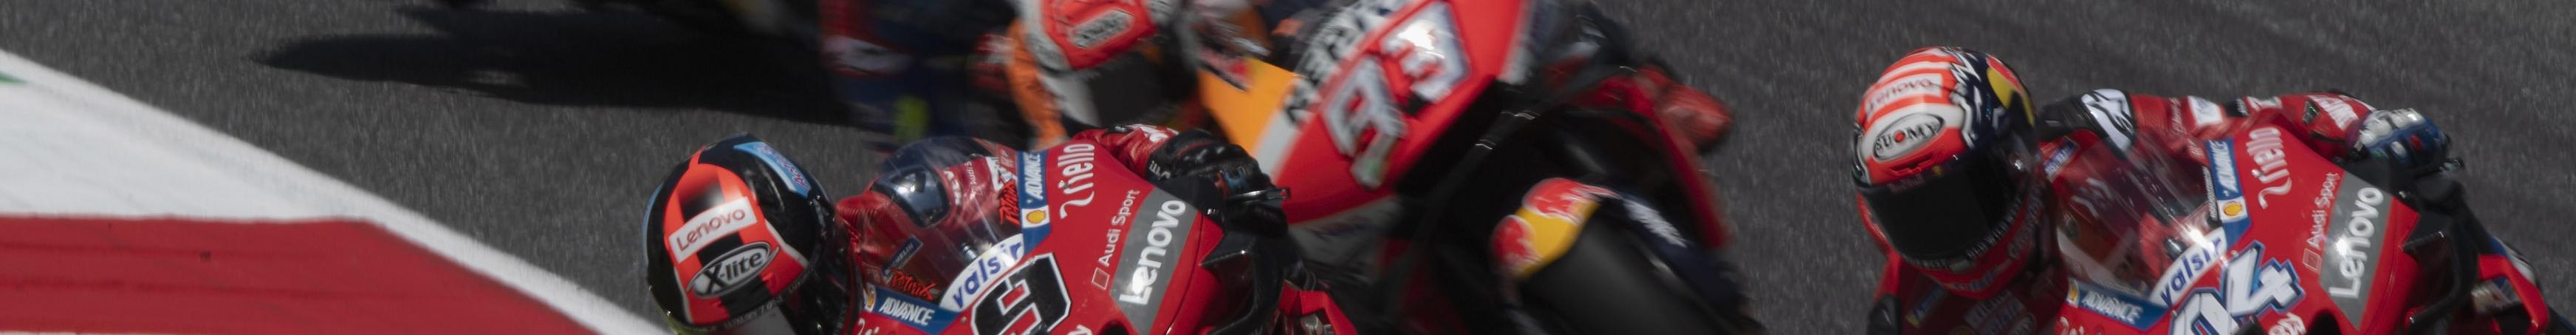 Moto GP: Με φόρα ο Πετρούτσι στο Gran Premi Monster Energy de Catalunya!